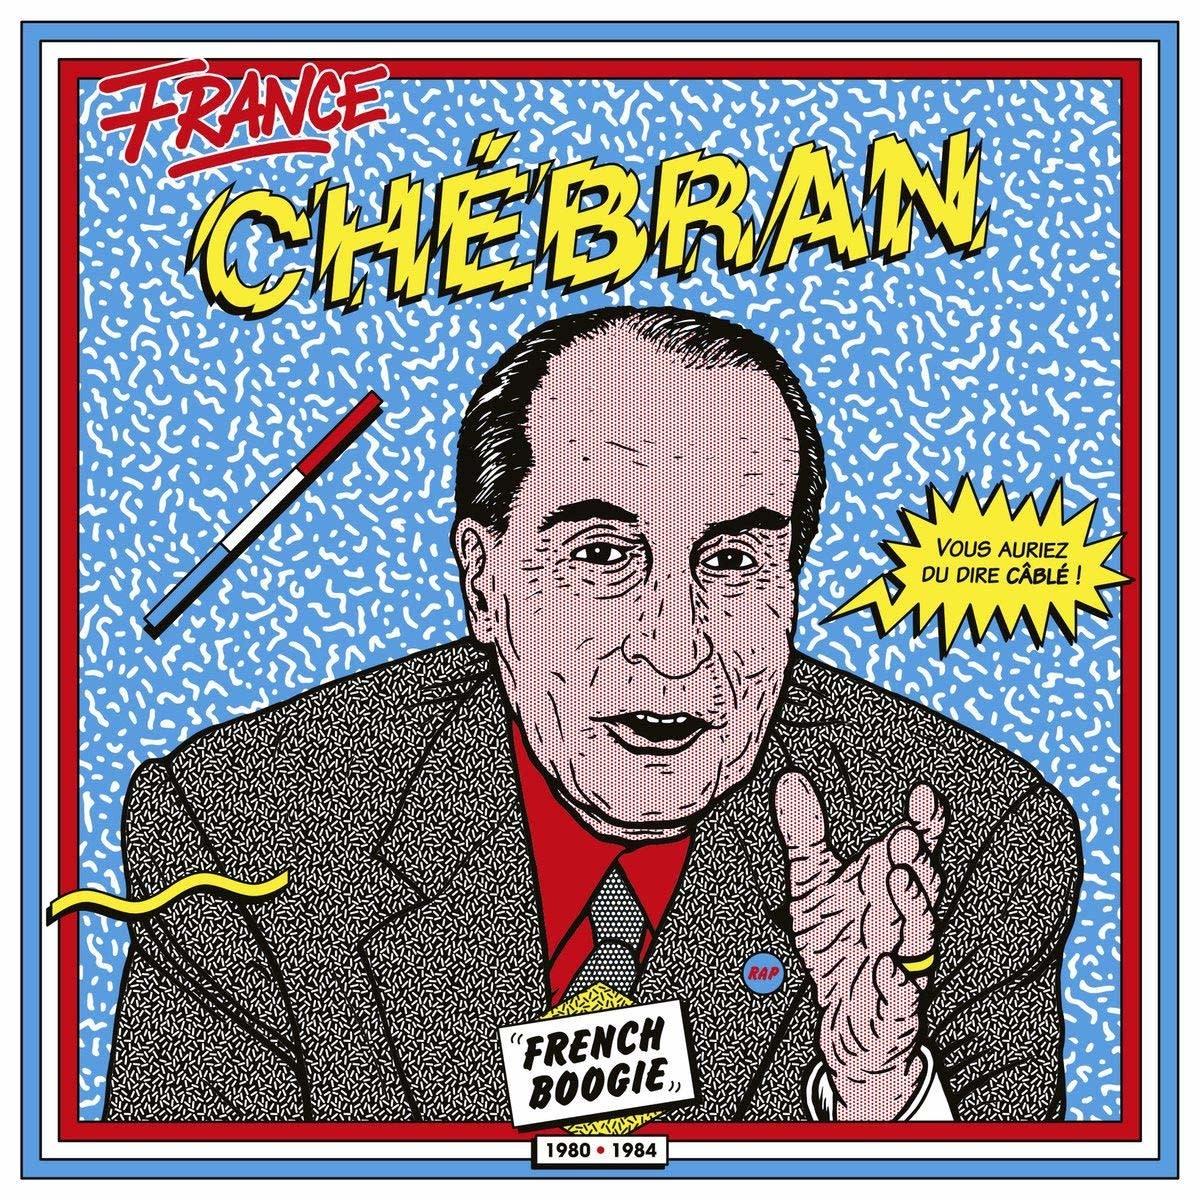 Artistes Variés • France Chébran, French Boogie 1980-1985-1